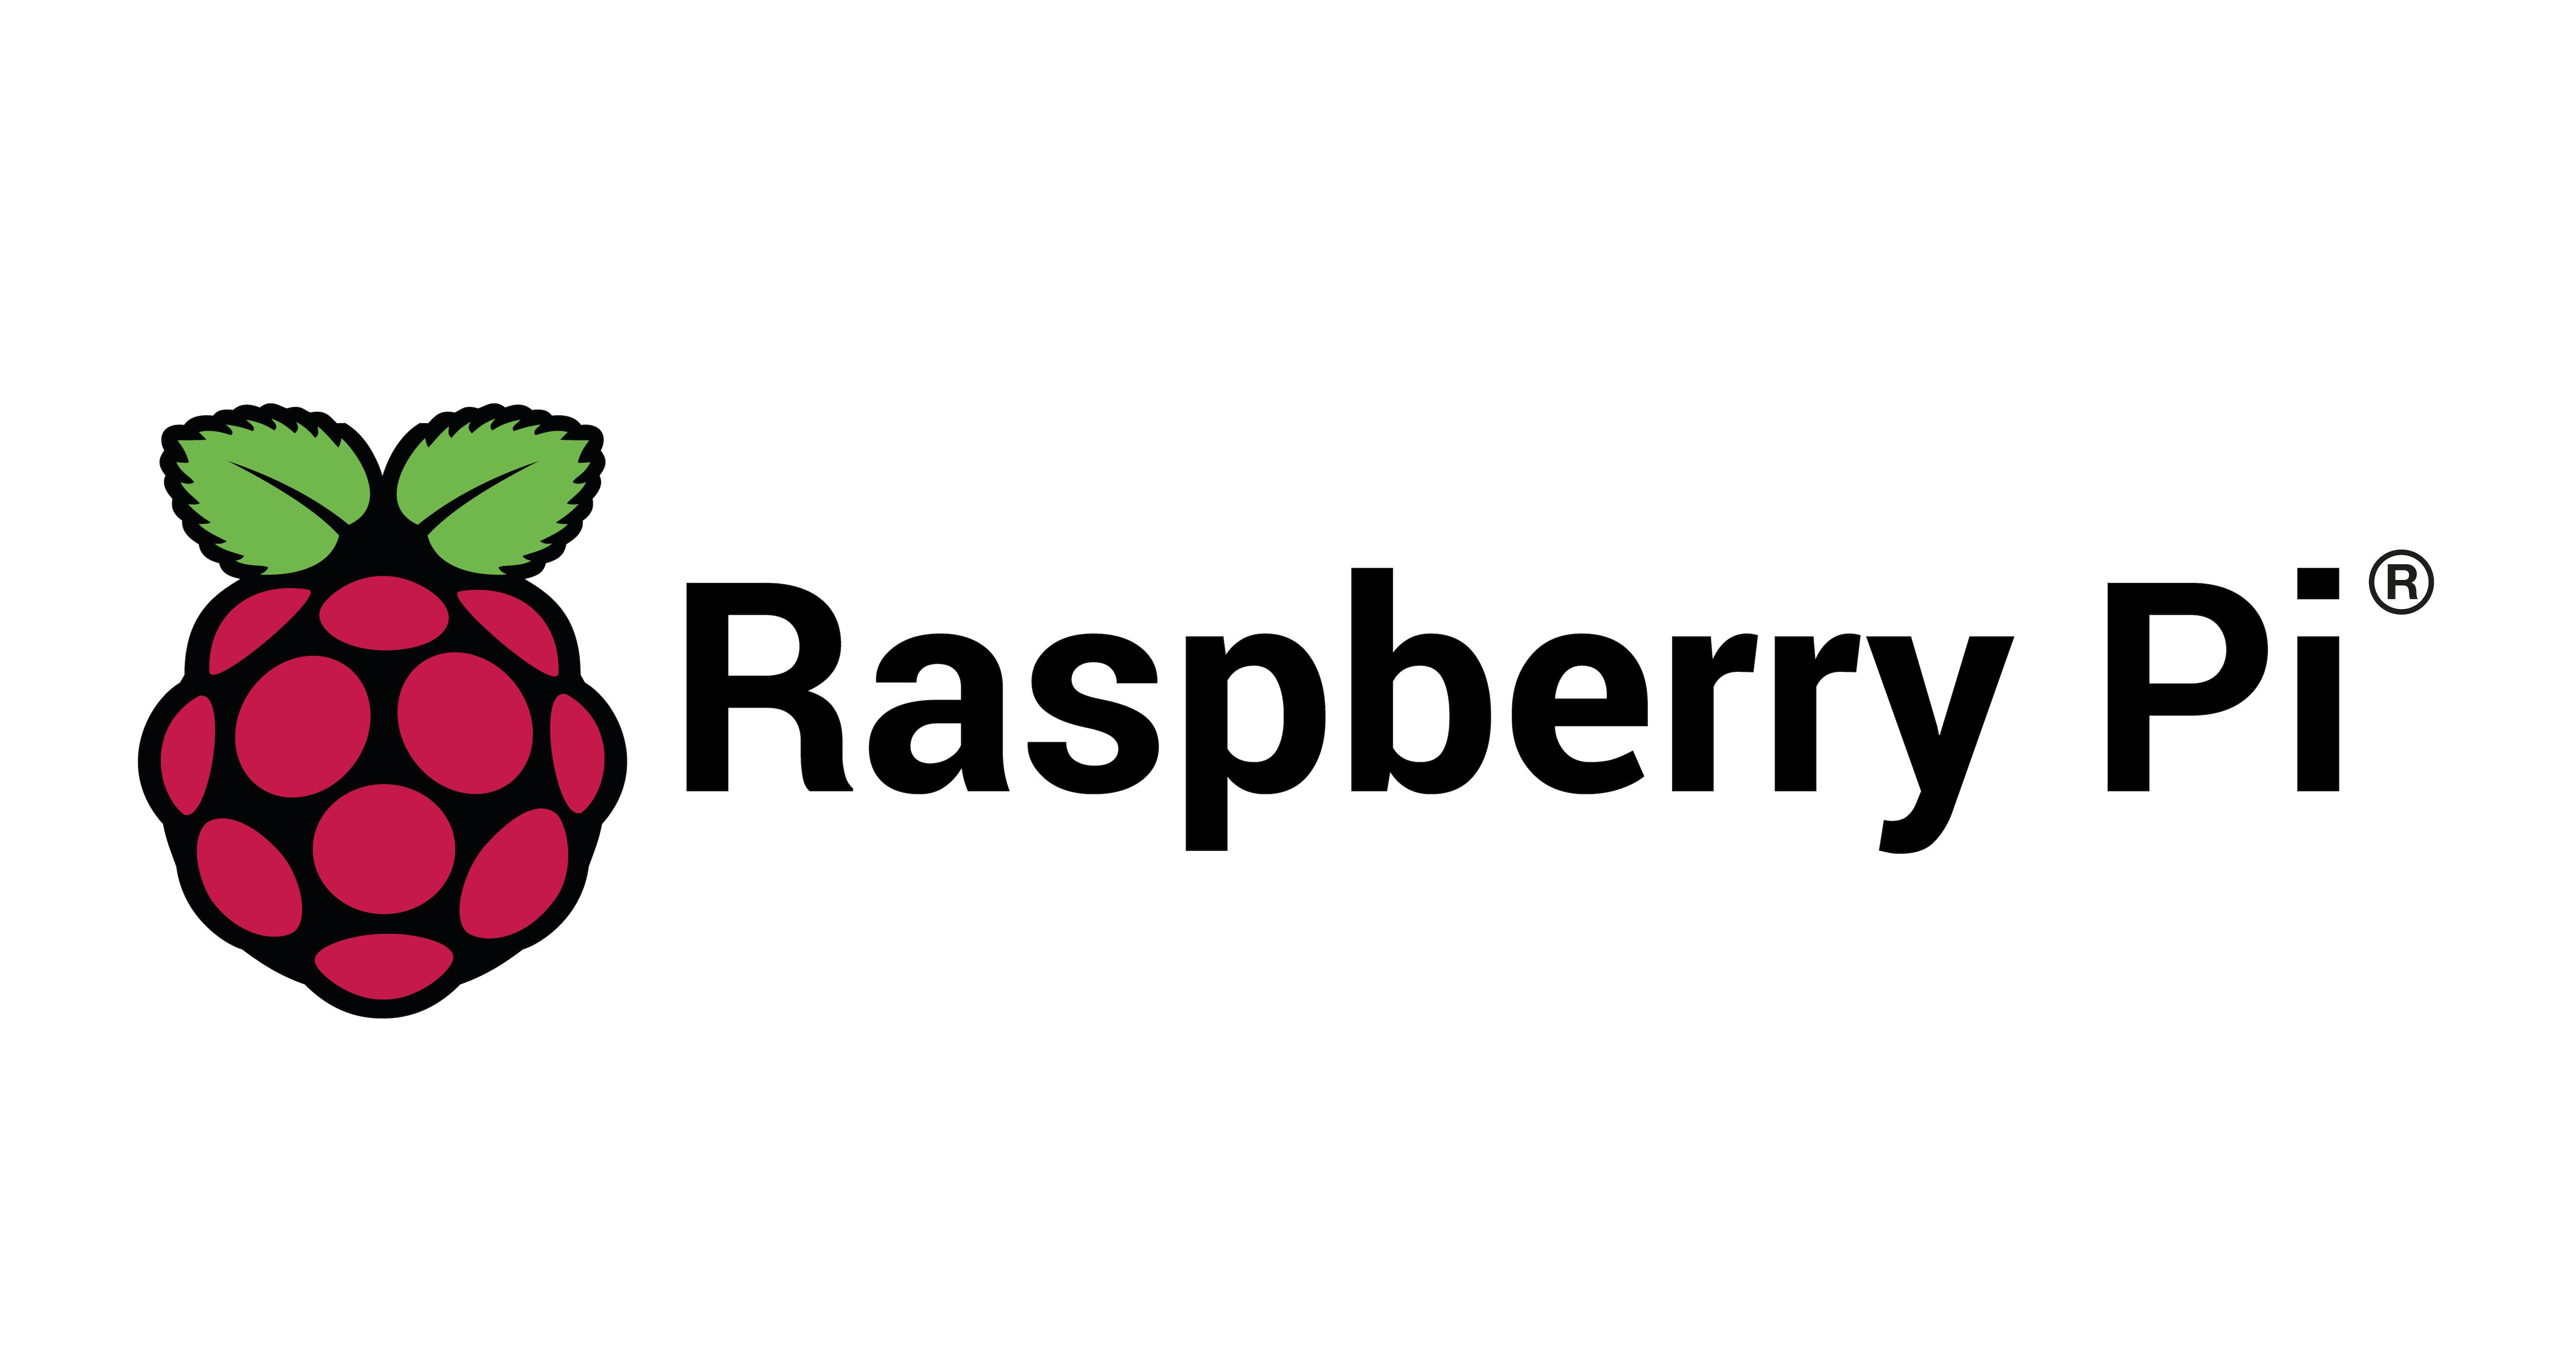 Raspberry Pi 4とMacをUSB type Cケーブルで接続してMacのインターネット接続を共有する手順 #RaspberryPi